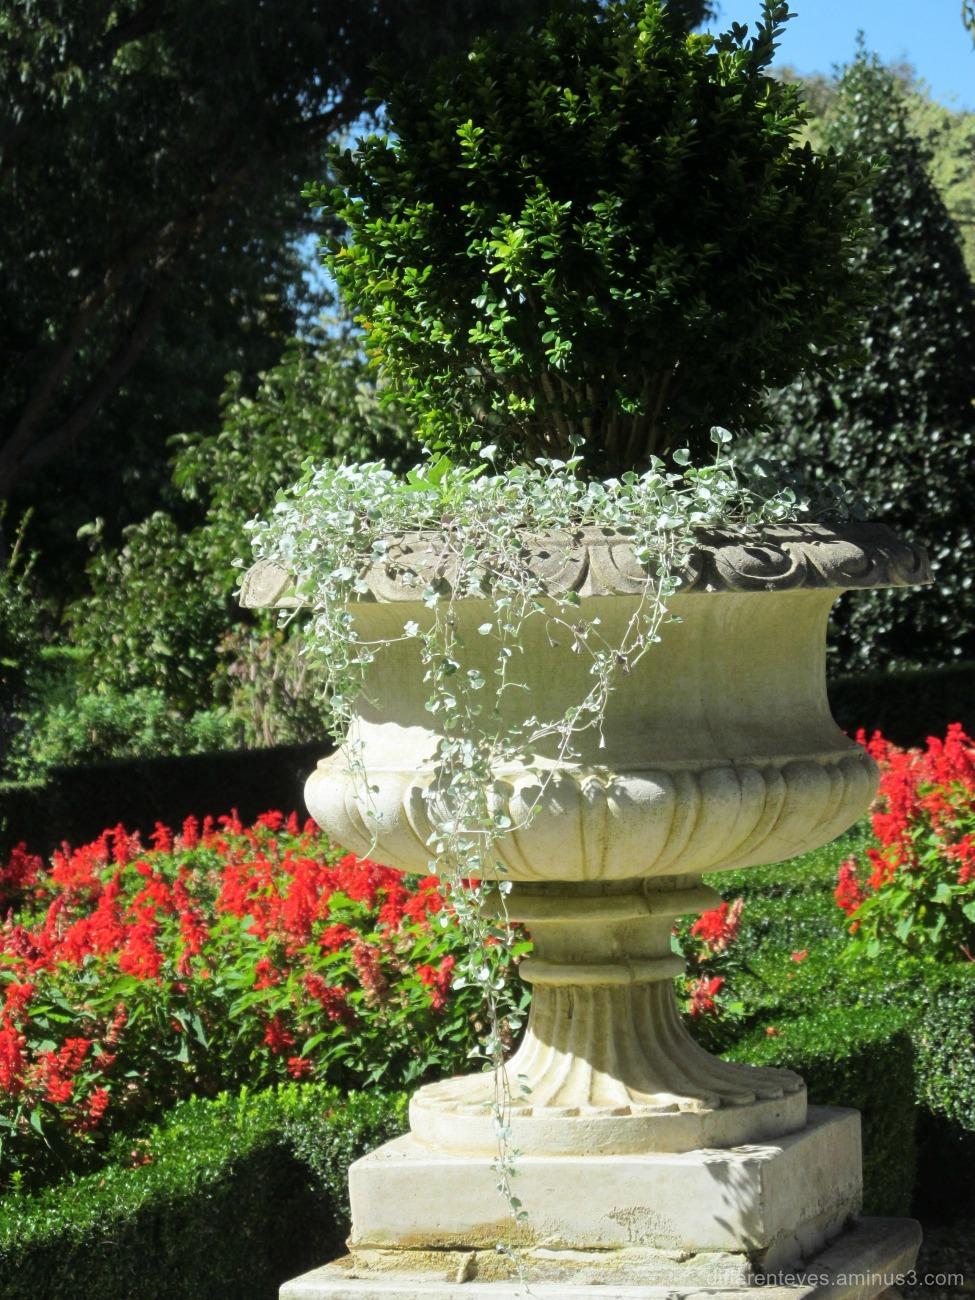 Enchanted Adventure Garden in Autumn